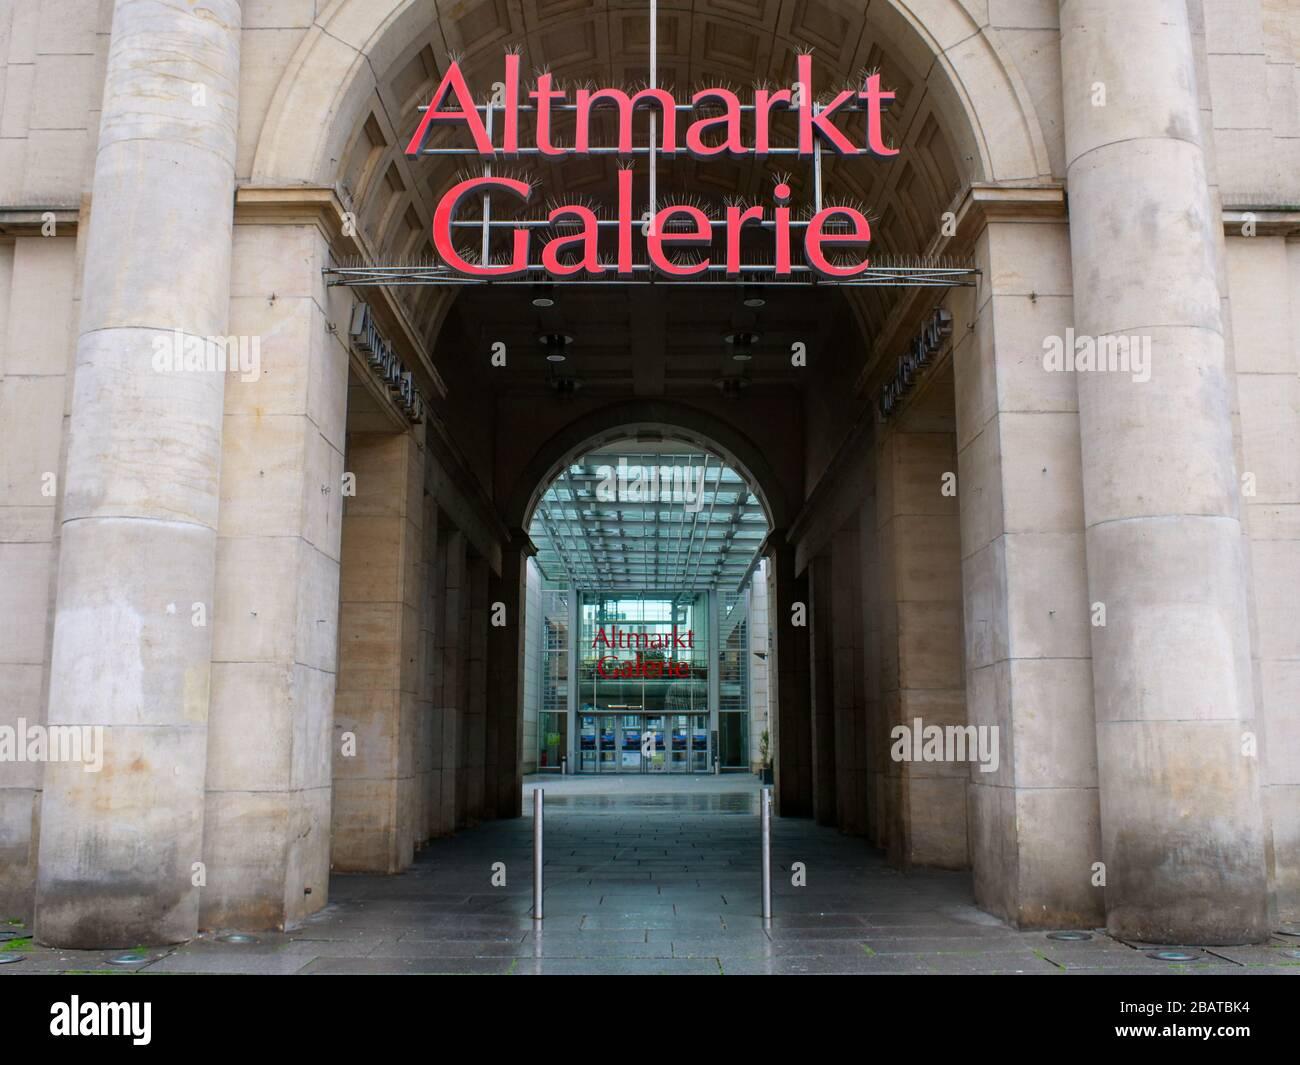 Altmarkt-Galerie in Dresden während Coronavirus Lockdown 2020 COVID-19 Ausgangssperre Regenwetter Regen Stock Photo